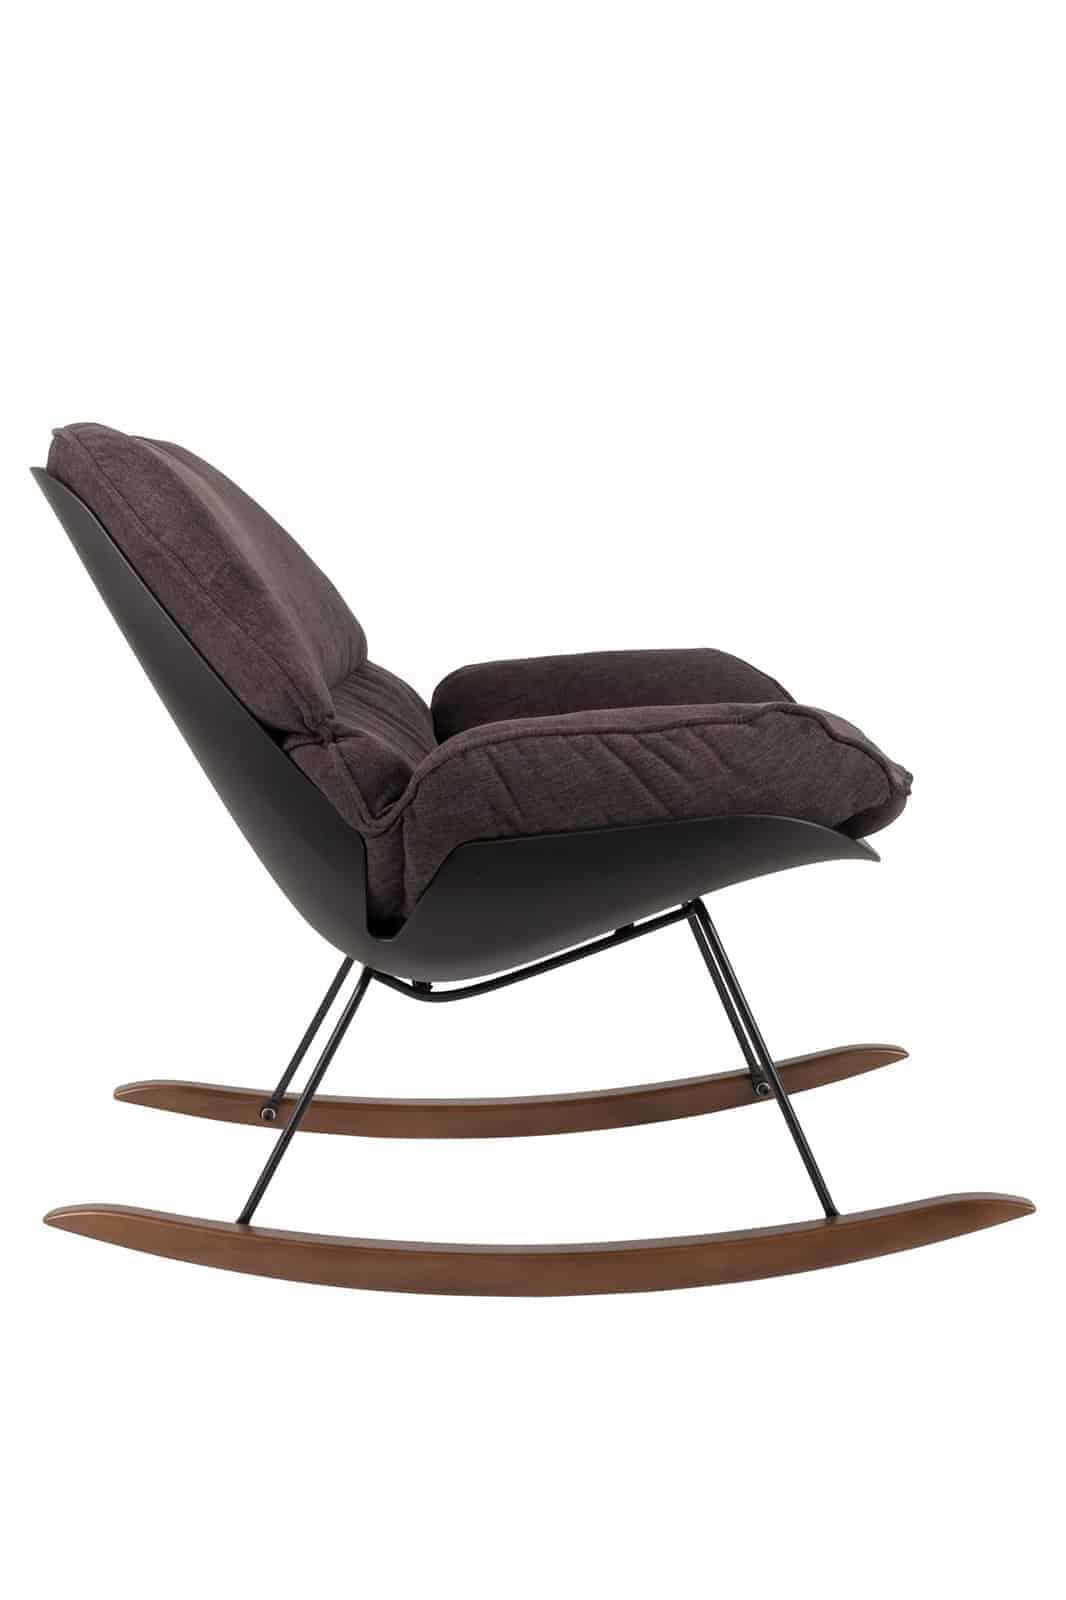 dark puffy rocking chair side angle